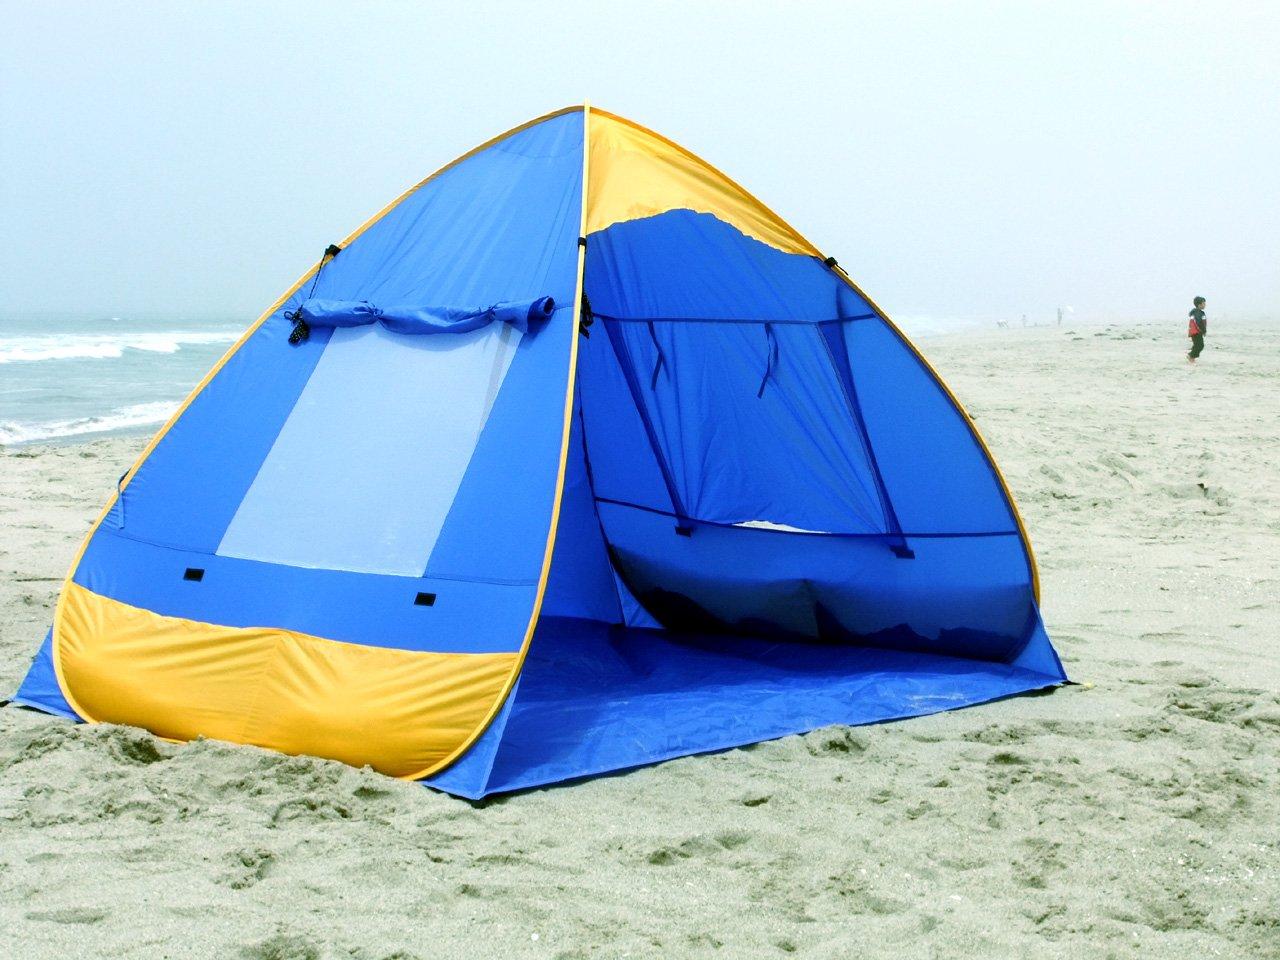 Genji Sports Pop Up Family Beach Tent and Beach Sunshelter Amazon.ca Sports u0026 Outdoors & Genji Sports Pop Up Family Beach Tent and Beach Sunshelter: Amazon ...